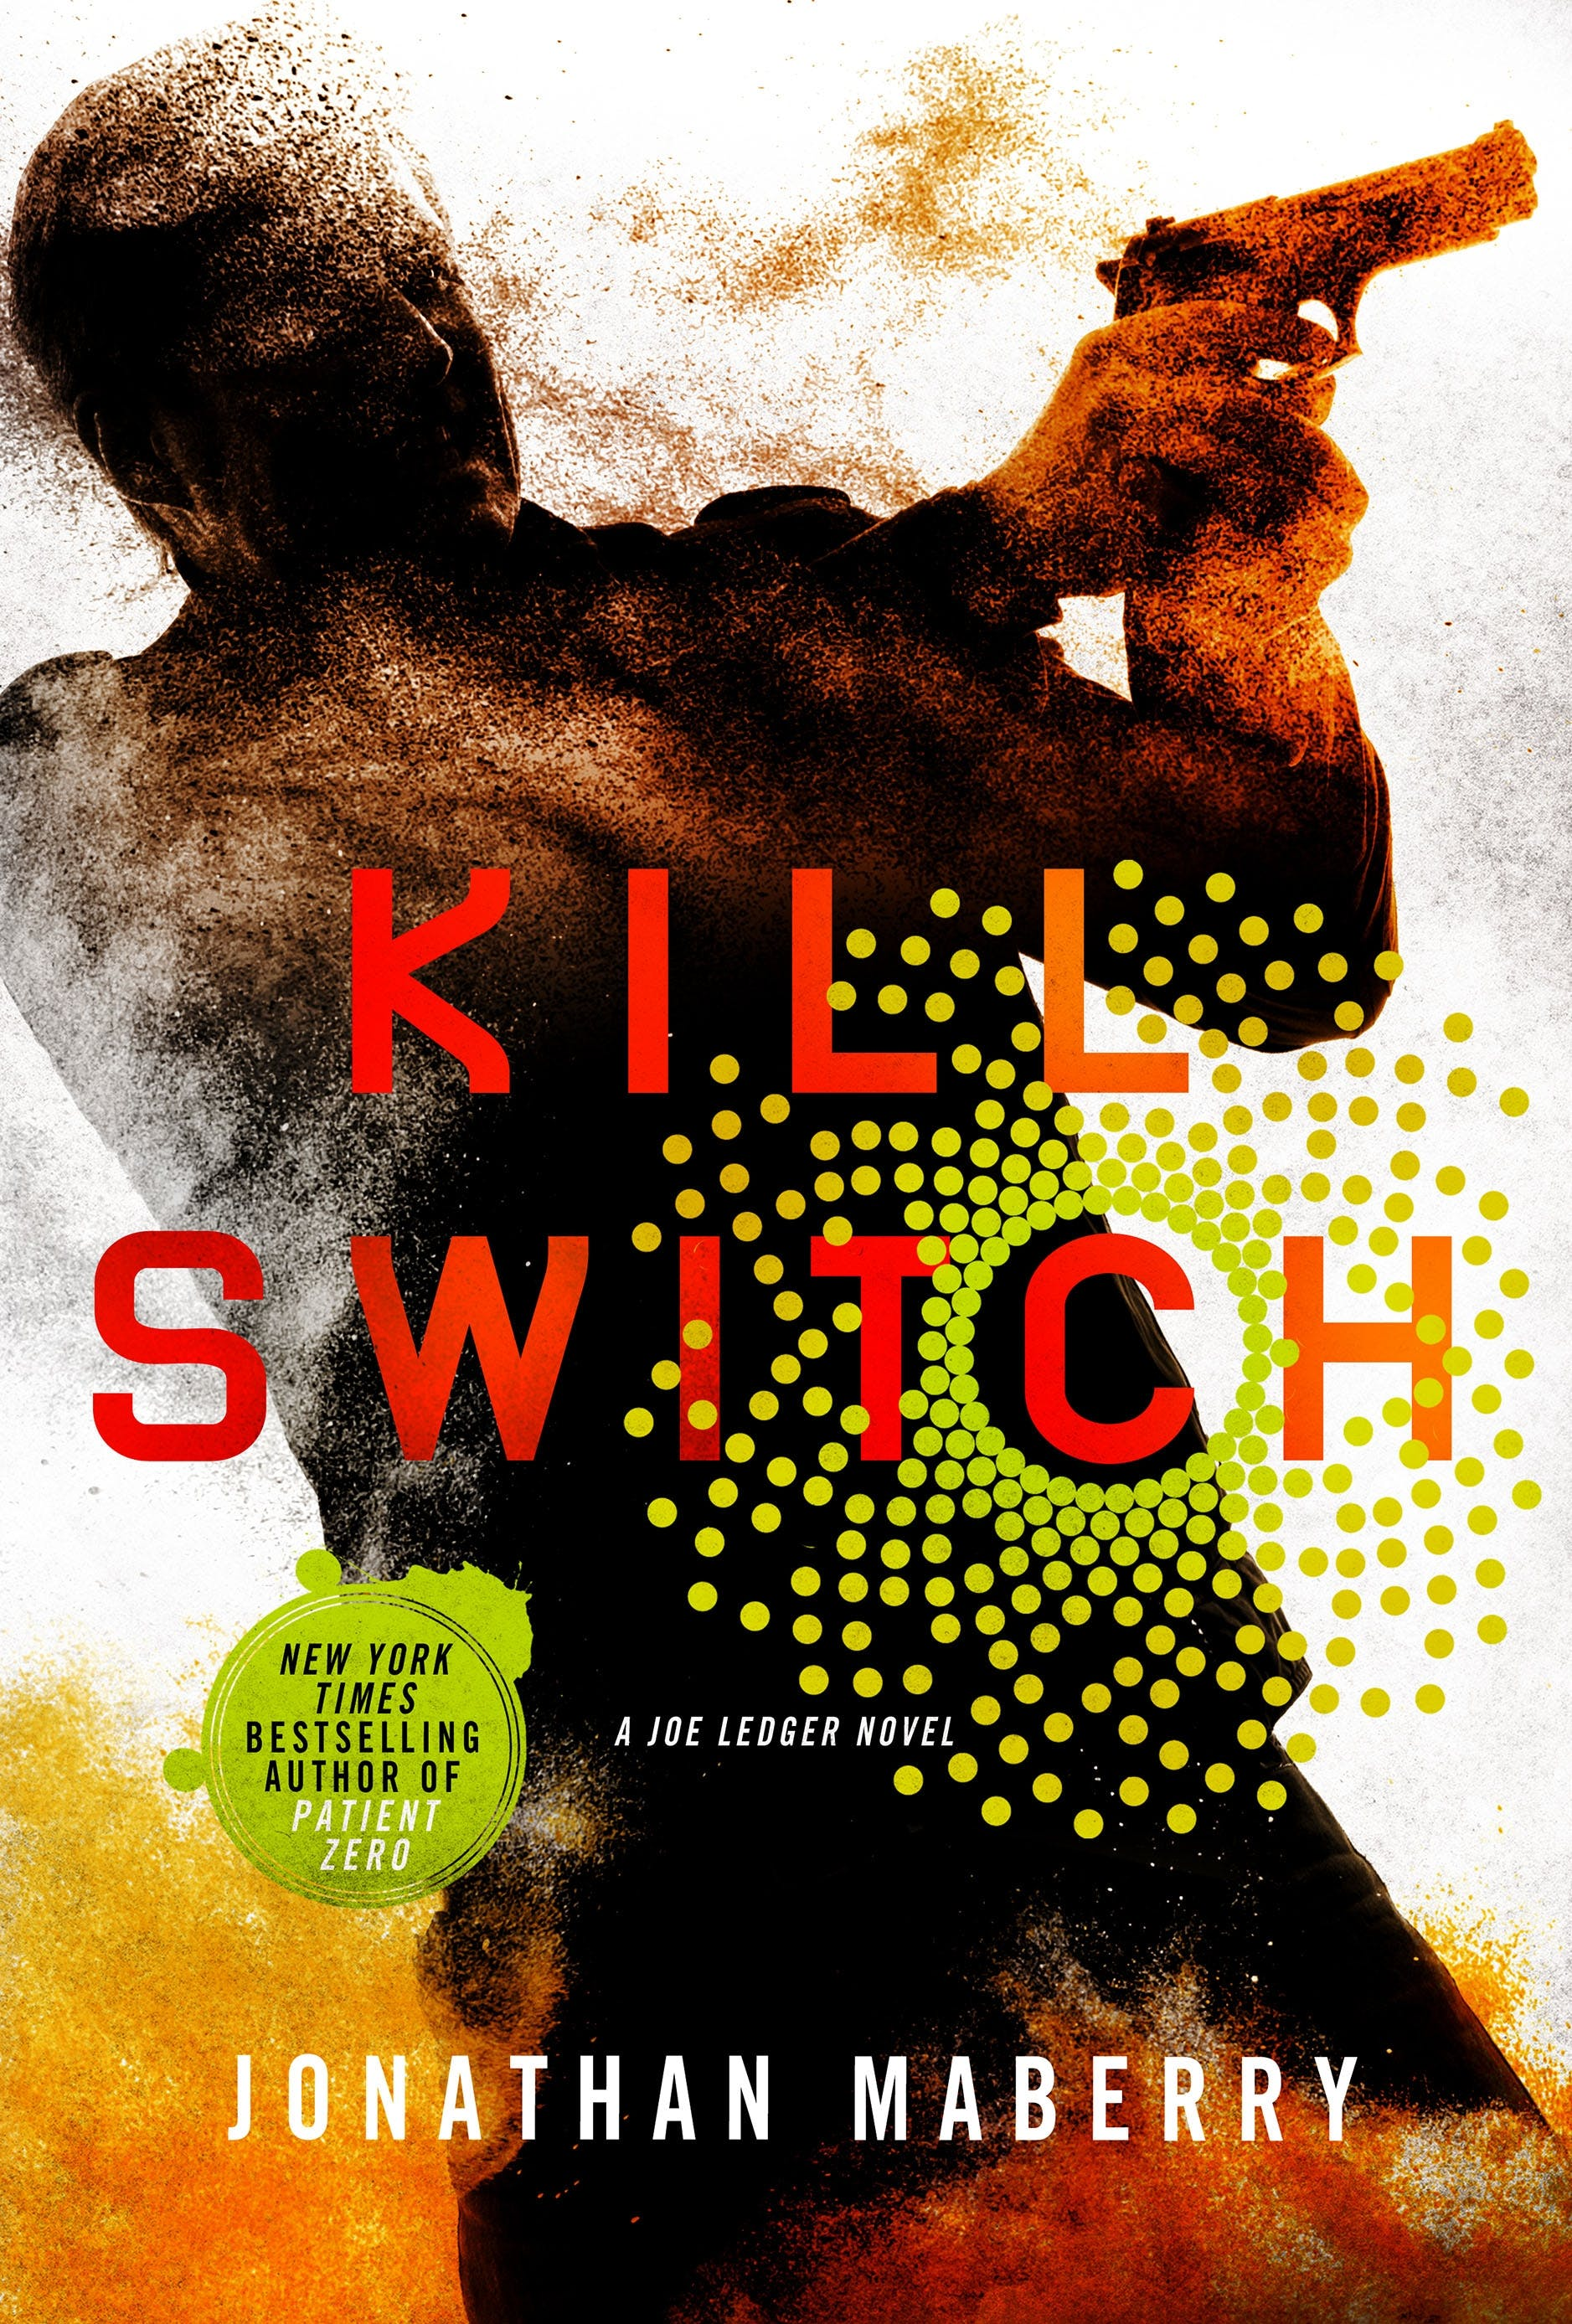 Image of Kill Switch